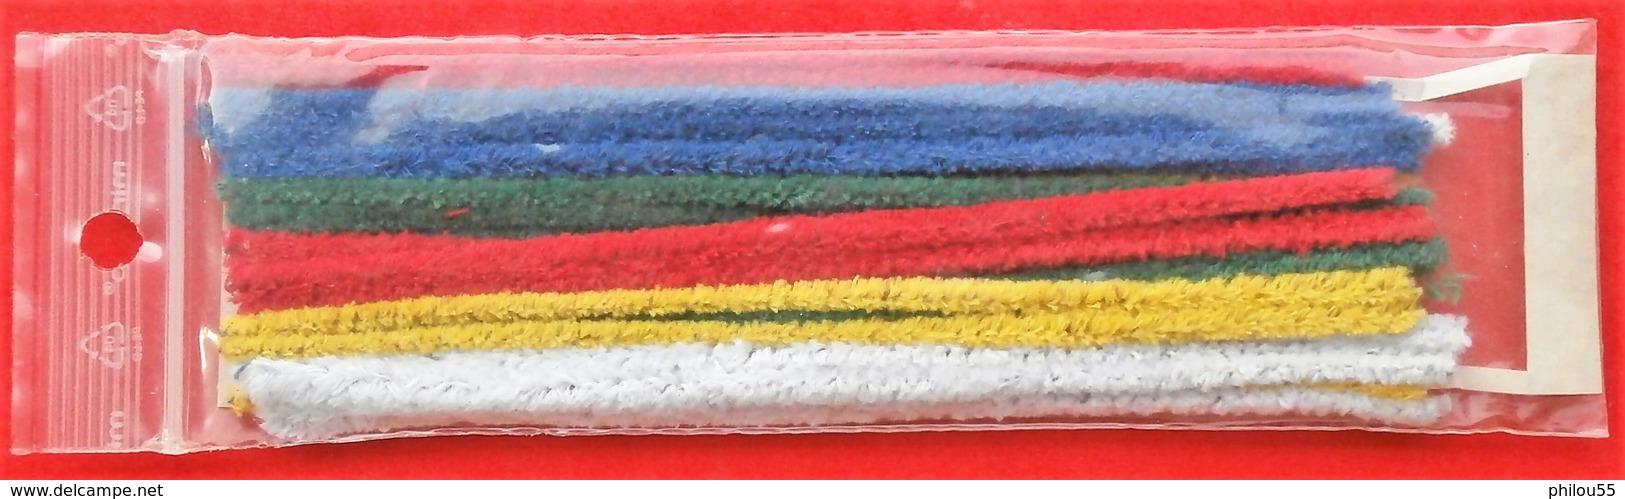 COLLECTION  Paquet De 25 Chenilles Coniques RIZLA + Extras - Pipe Cleaner